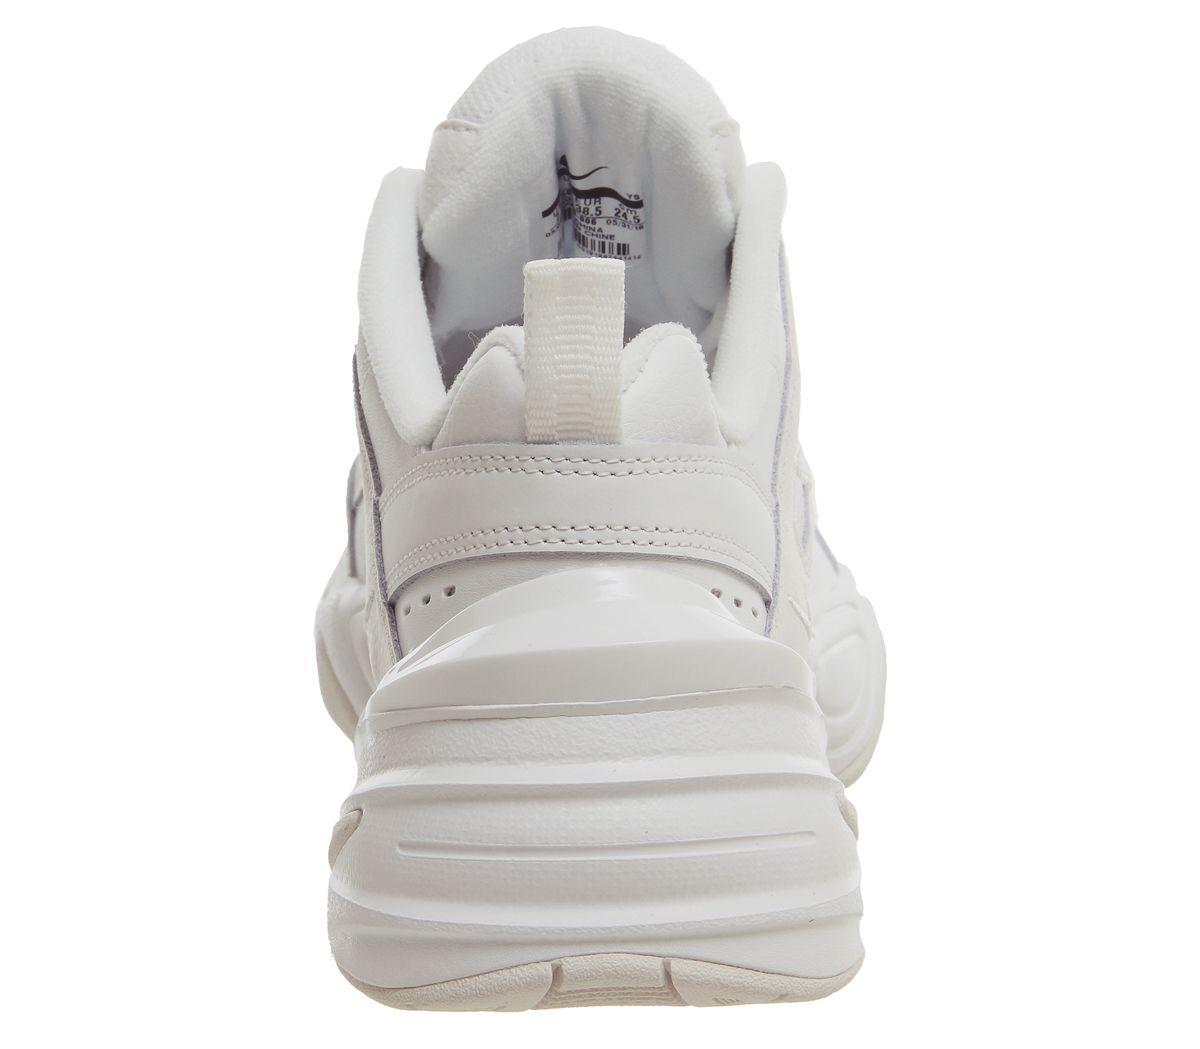 2fde6474d Nike M2k Tekno Phantom Summit White - Unisex Sports